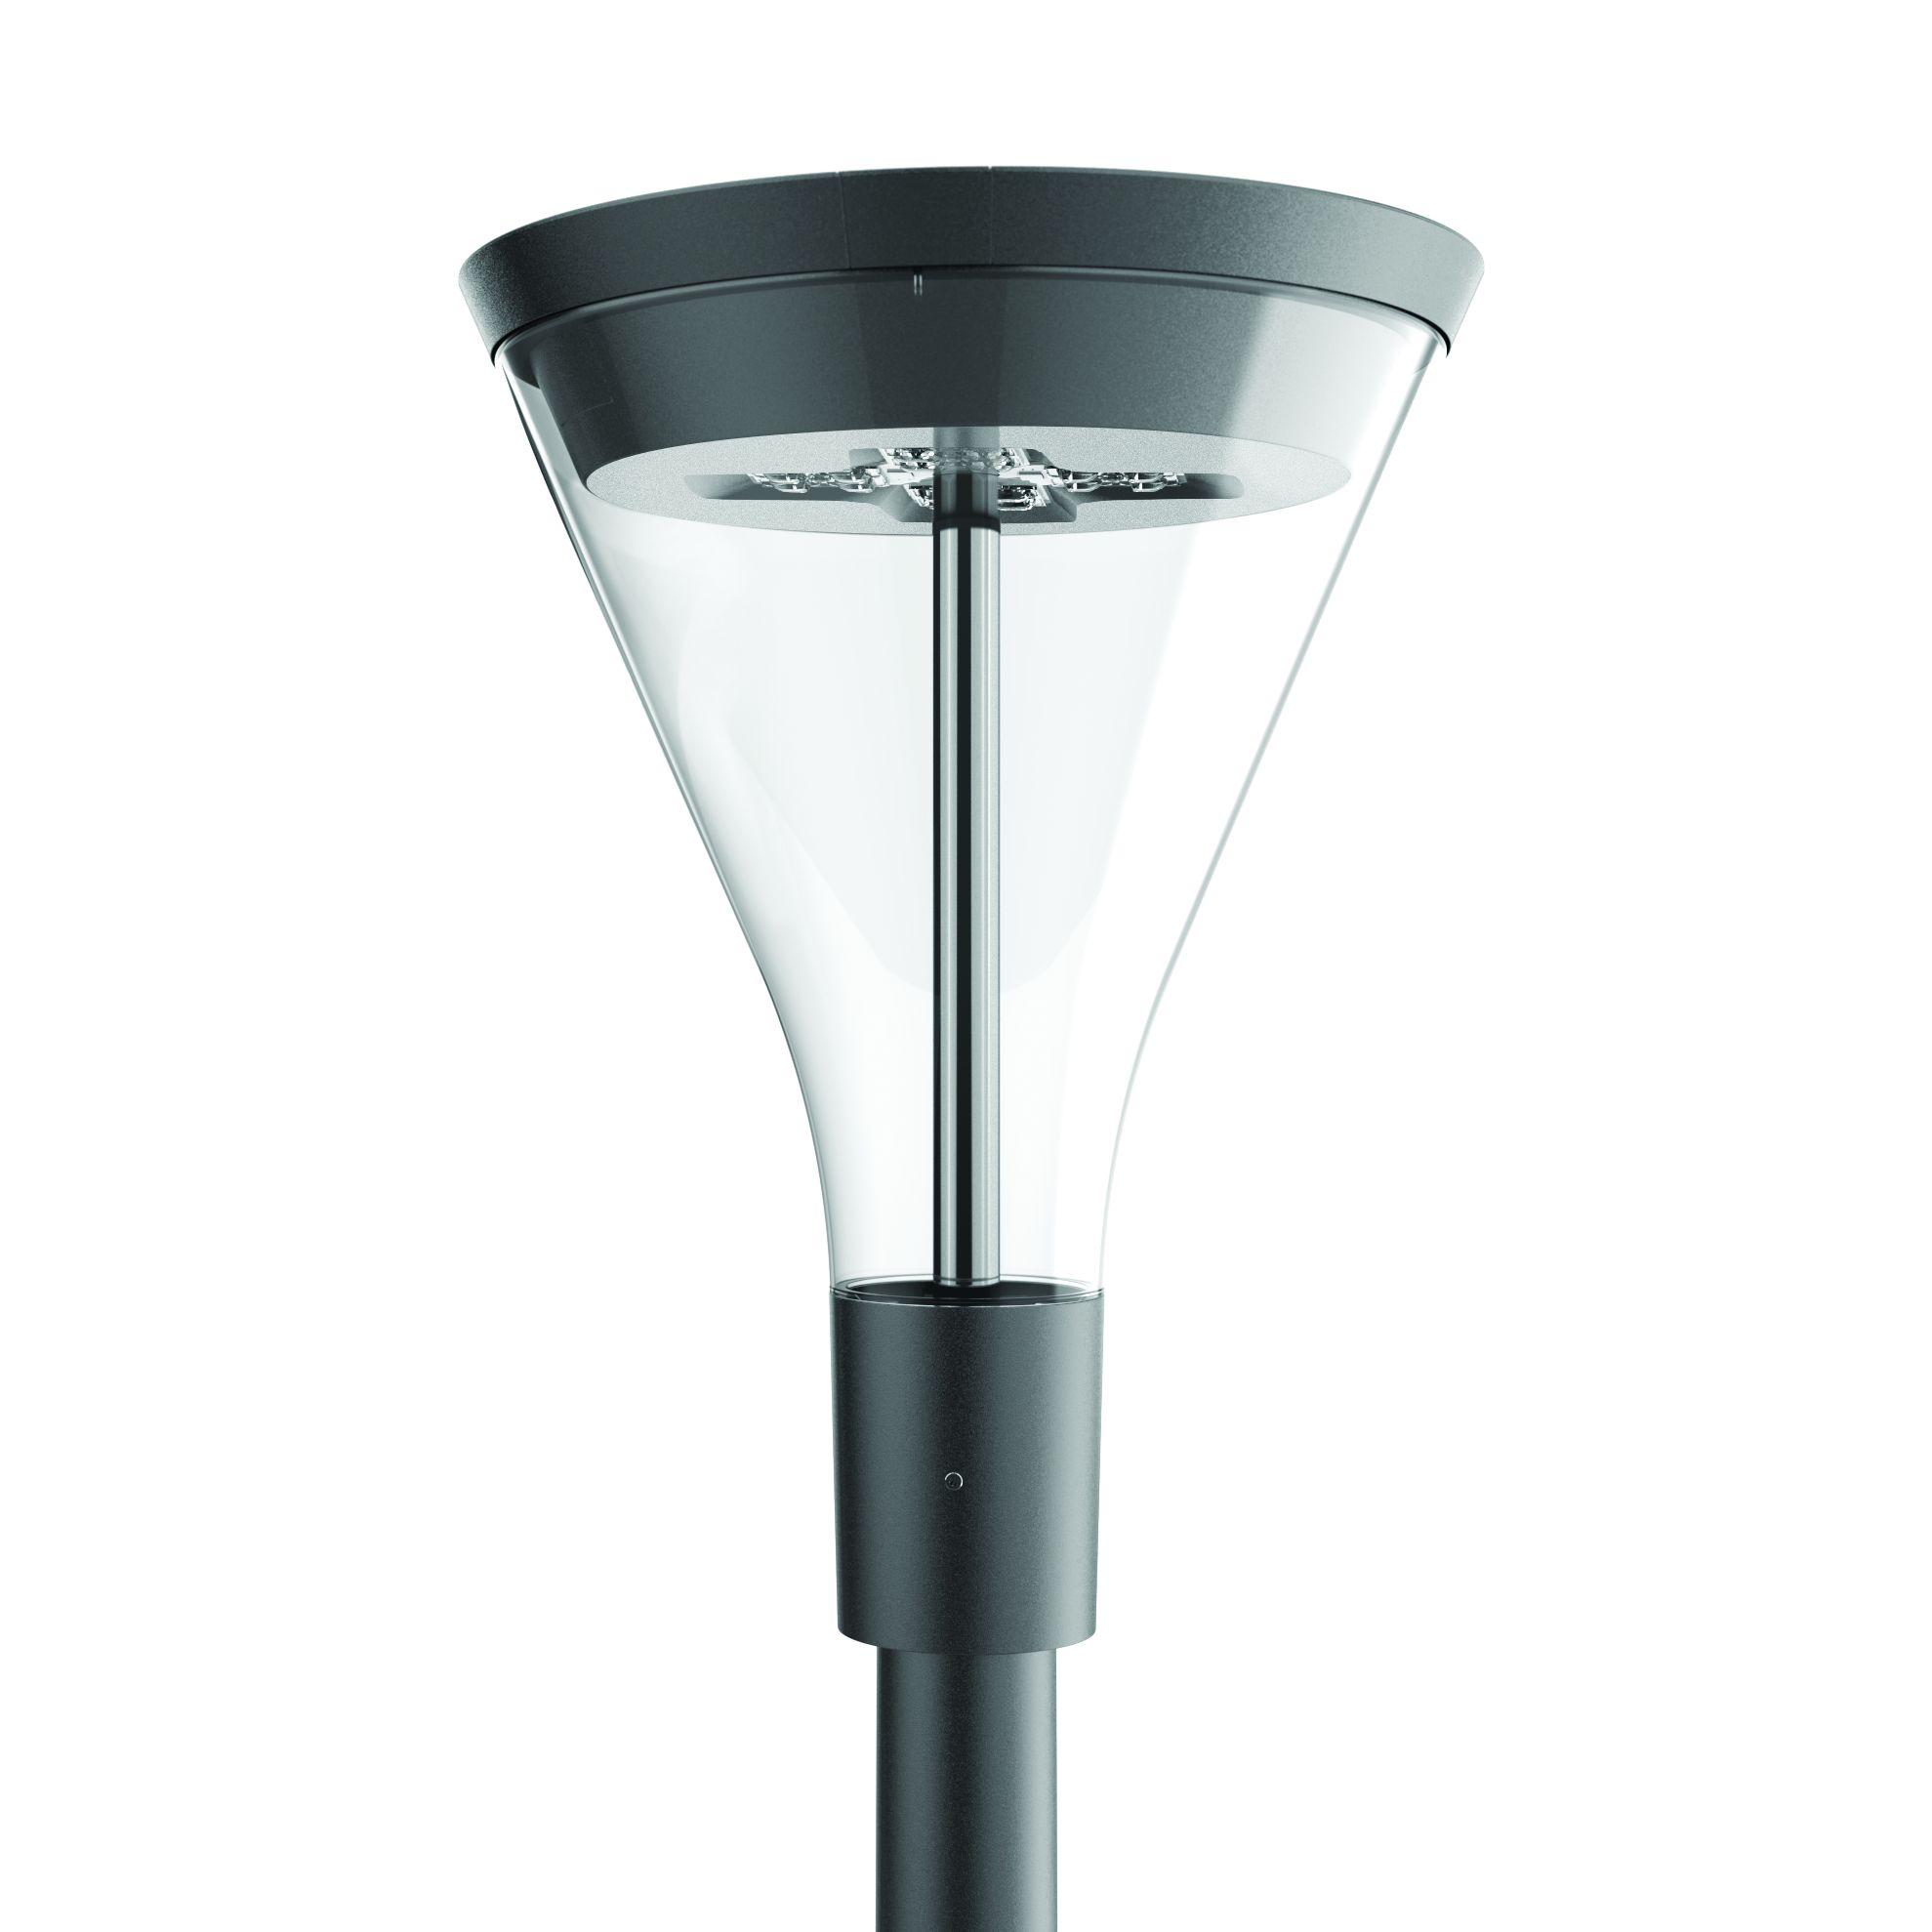 1 Stk Parc II LED 35W 4200lm 4000K rotationssymmetrisch, grafit  LIG5508231